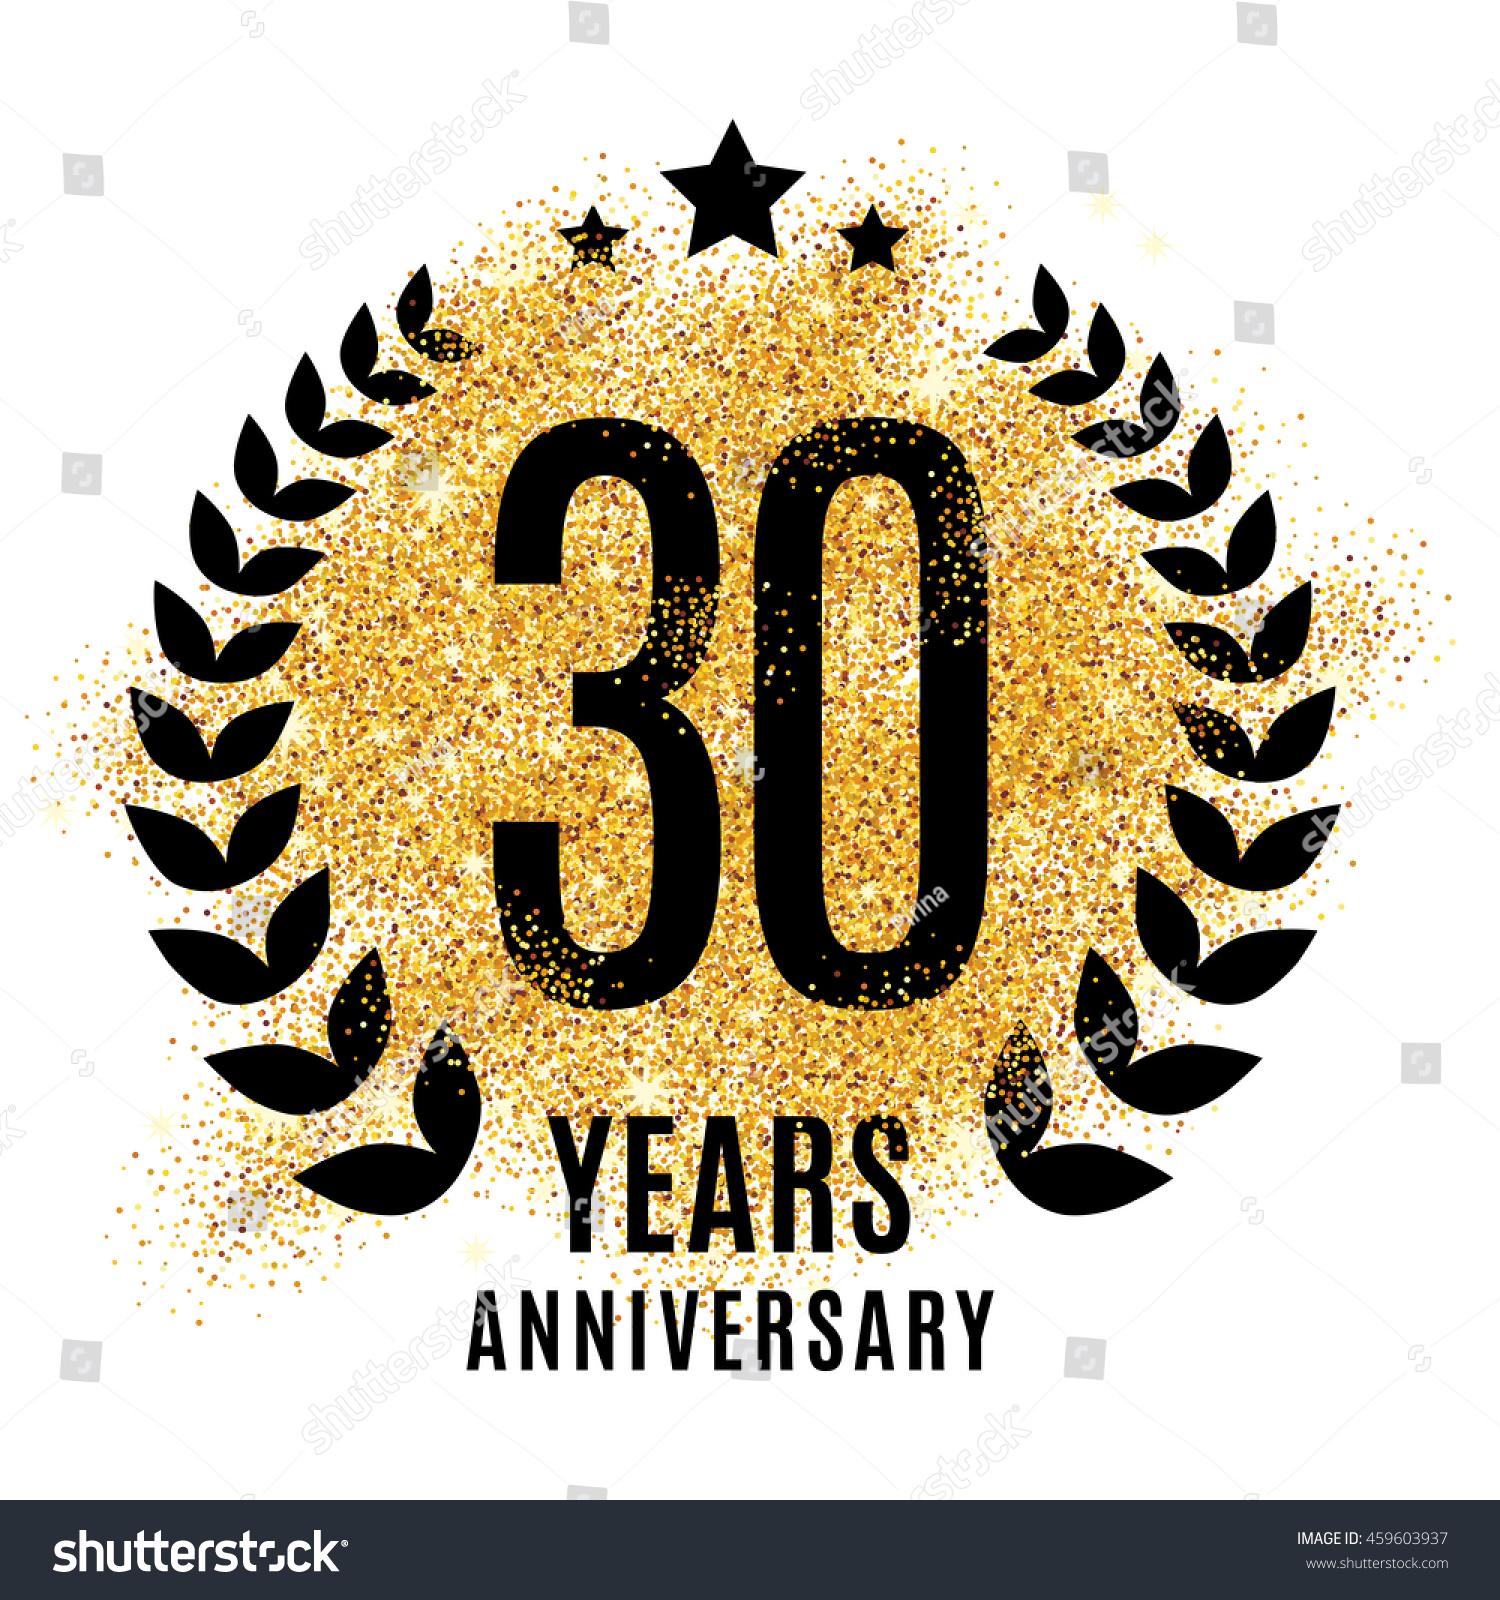 30 Year Anniversary Symbol: Thirty Years Golden Anniversary Sign Gold Stock Vector